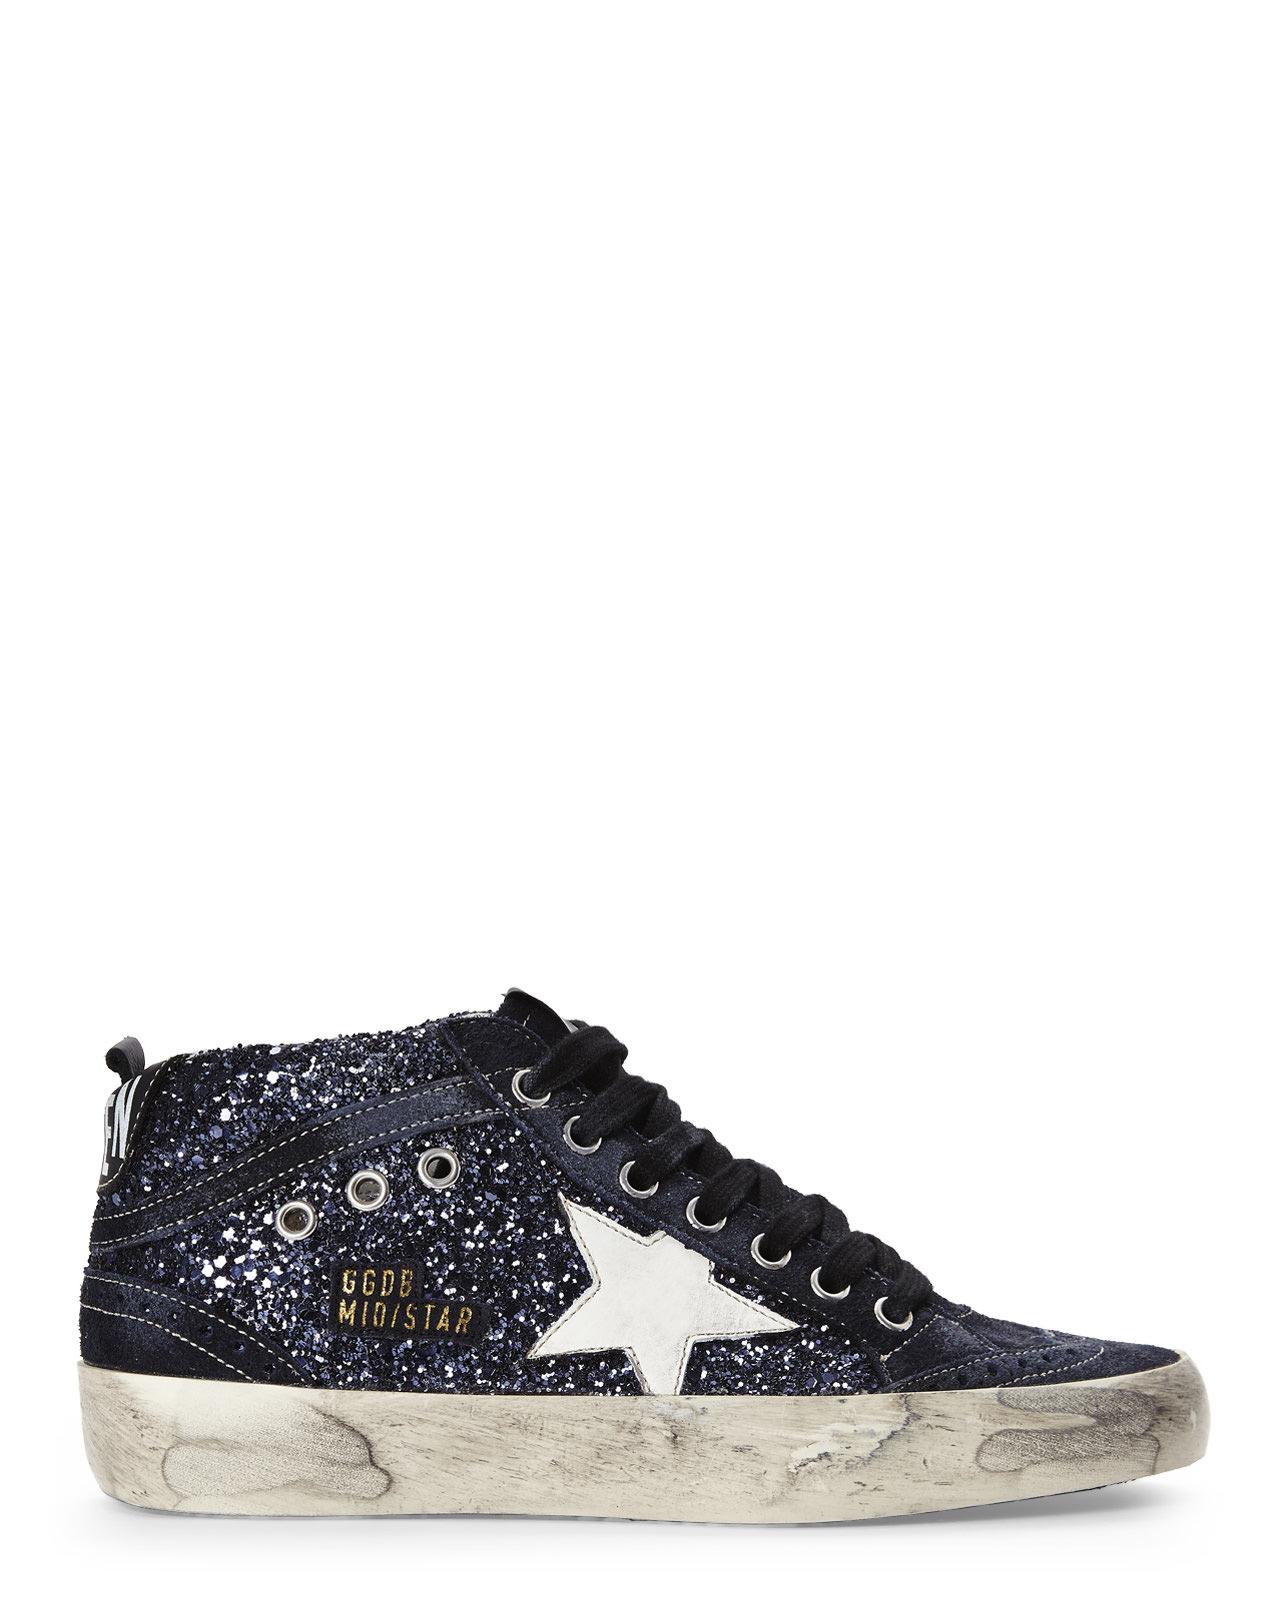 3132213109607 Lyst - Golden Goose Deluxe Brand Blue Glitter Mid Star Sneakers in Blue